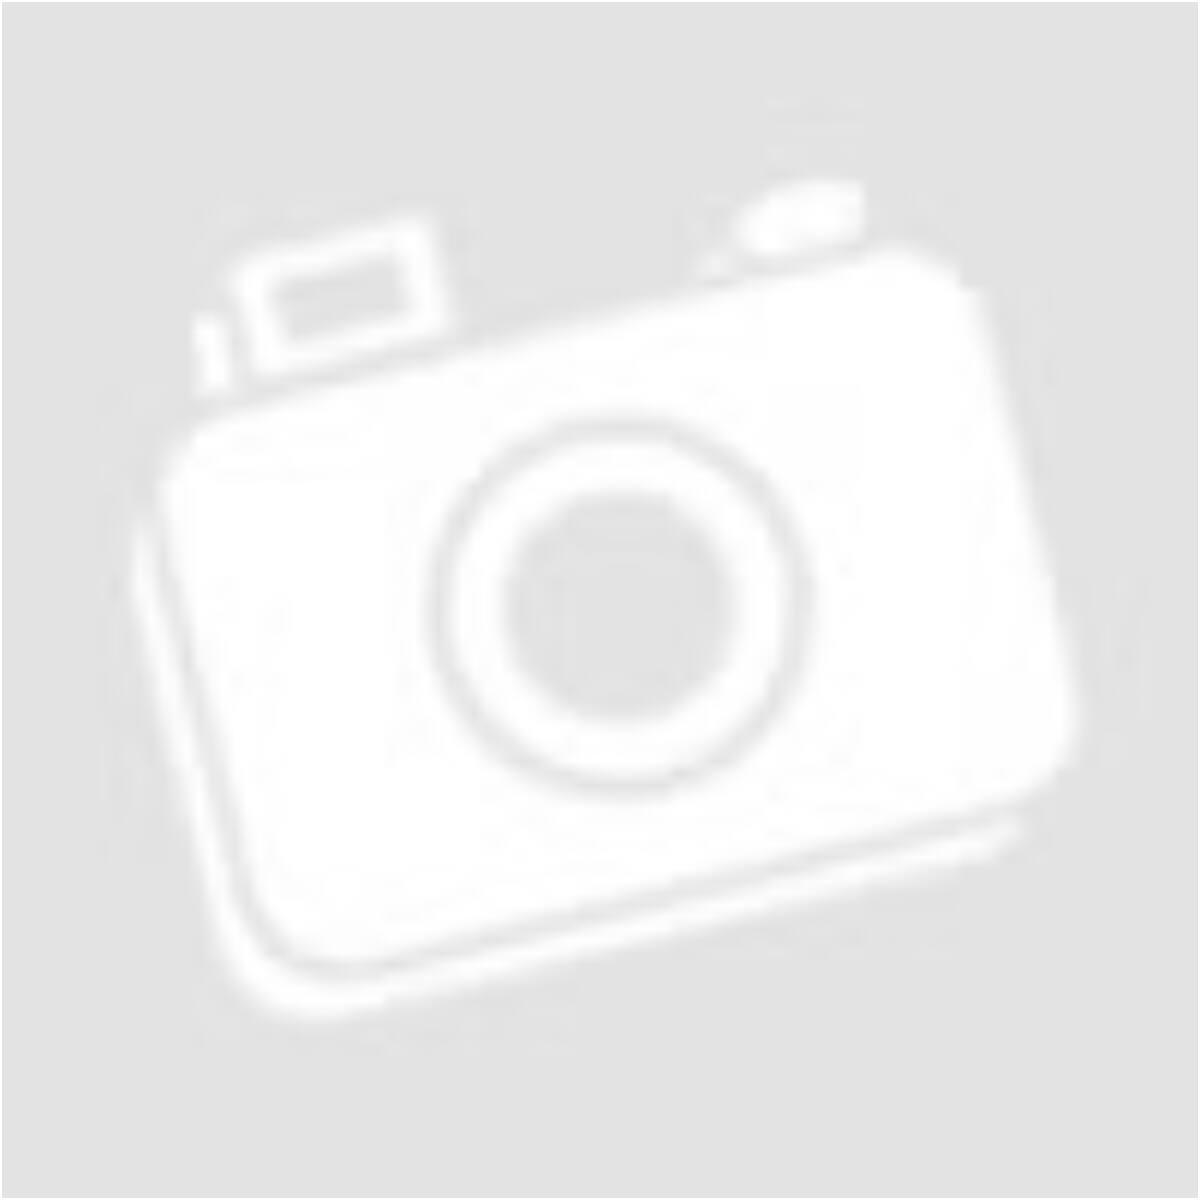 2in1 Férfi kabát  B3550 - fekete - Télikabátok 397b52cd21